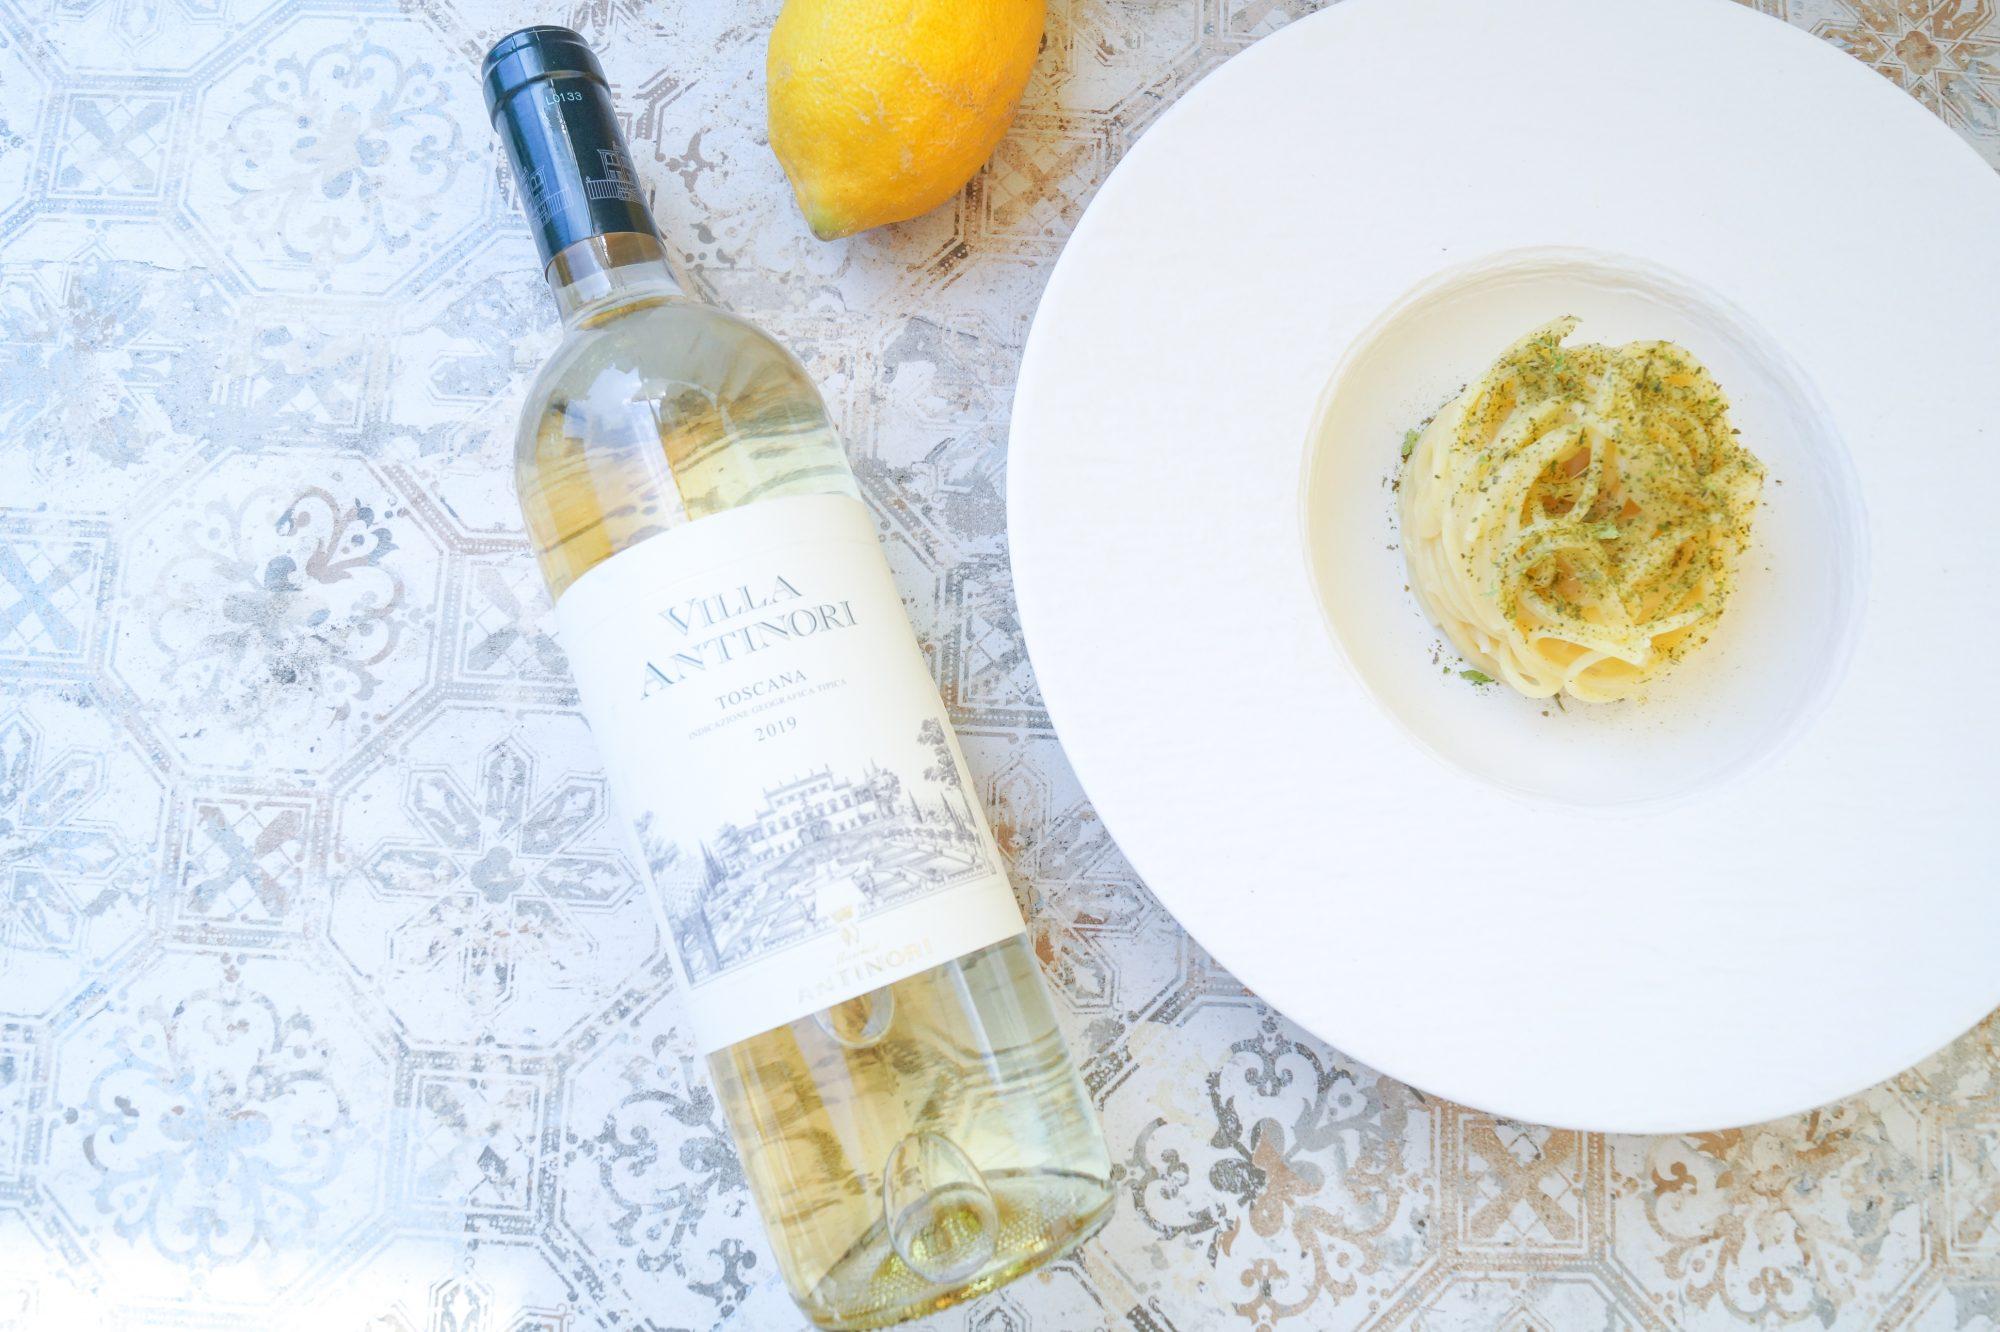 Wein des Monats Juli – Villa Antinori Bianco Toscana IGT